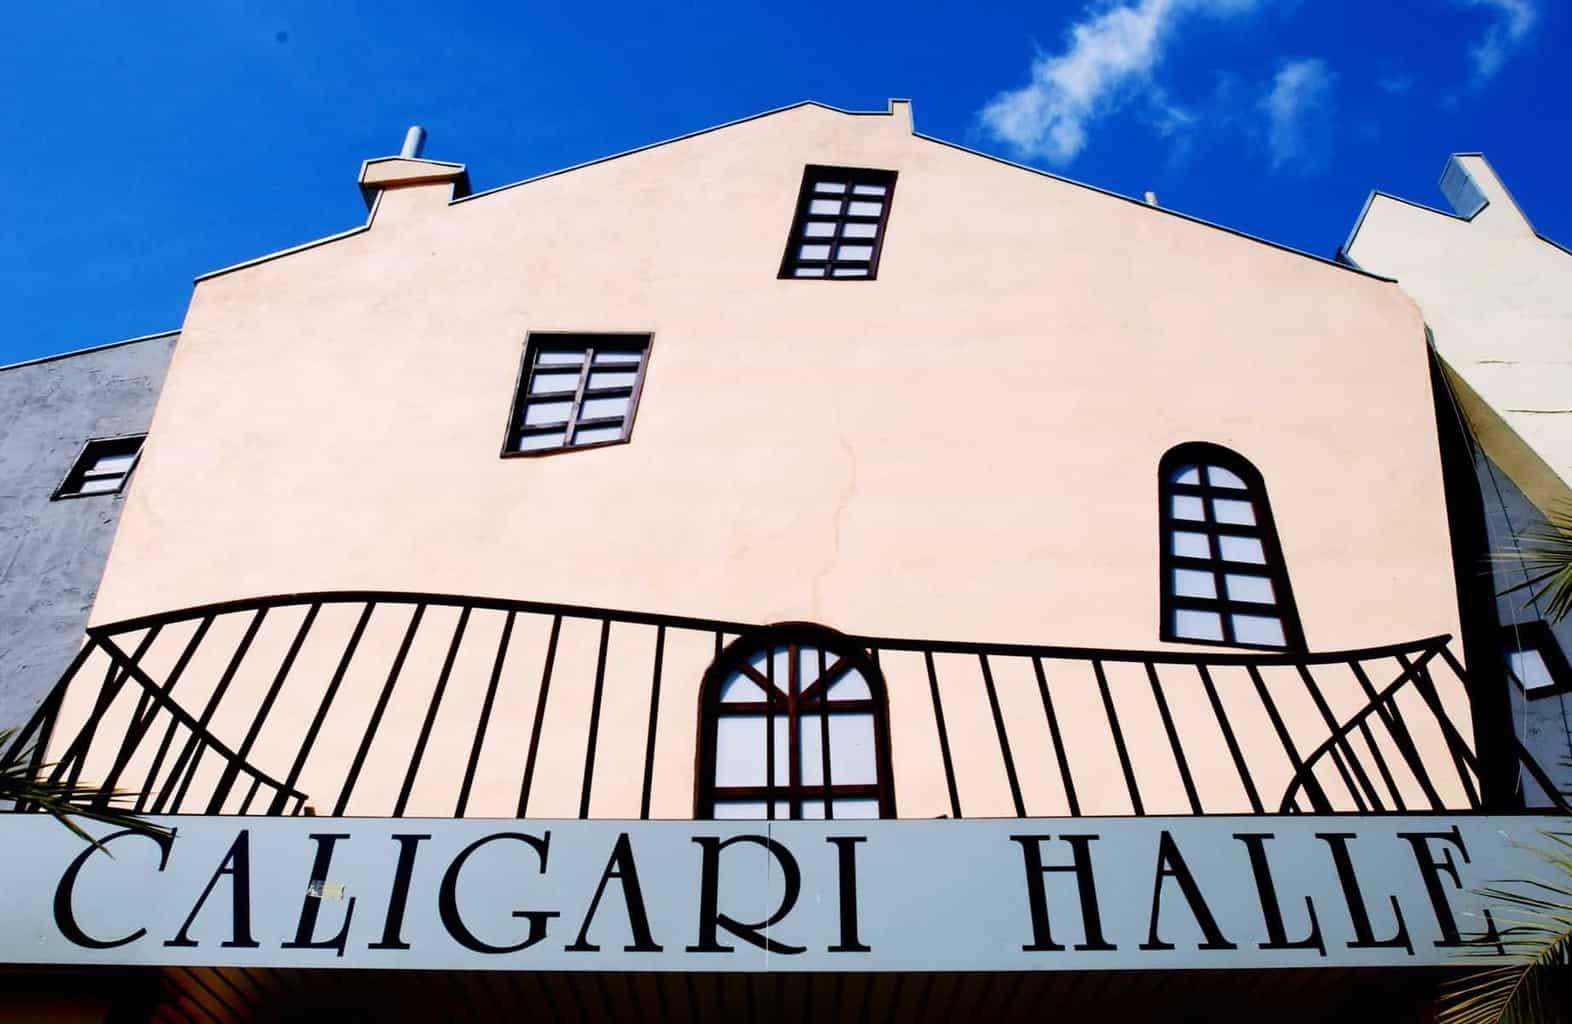 Caligari Halle Potsdam